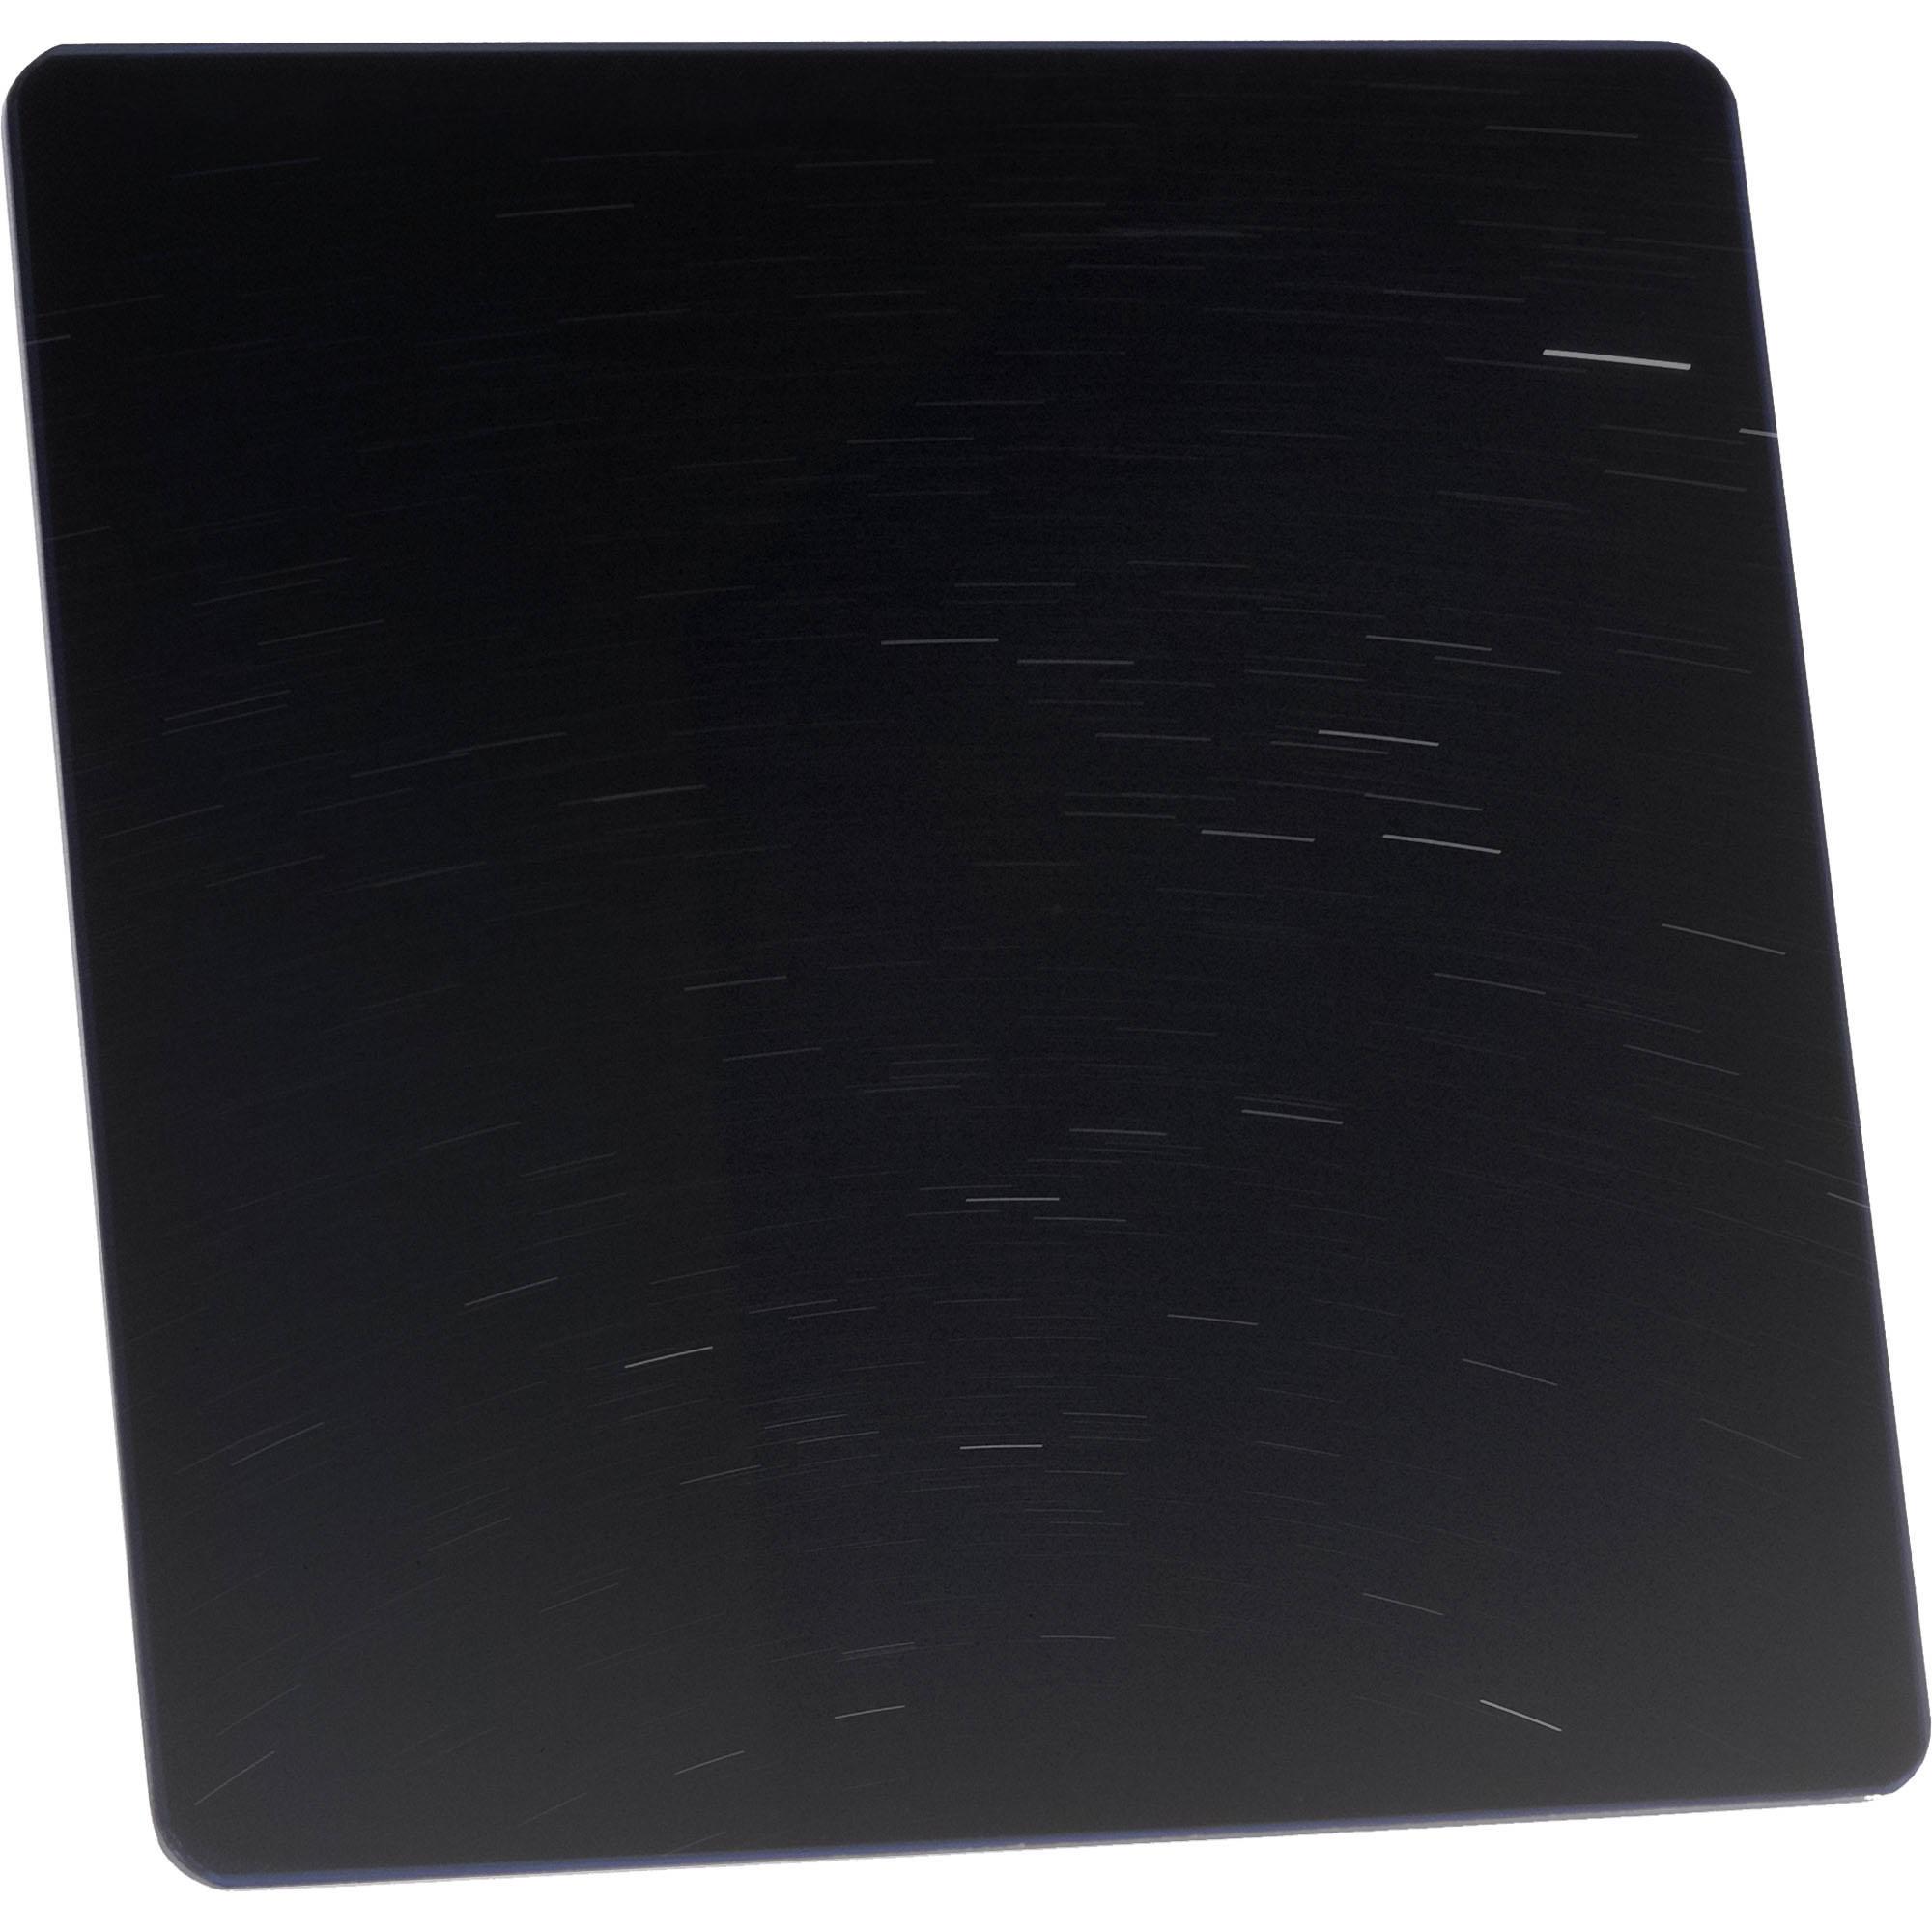 square star trails.jpg